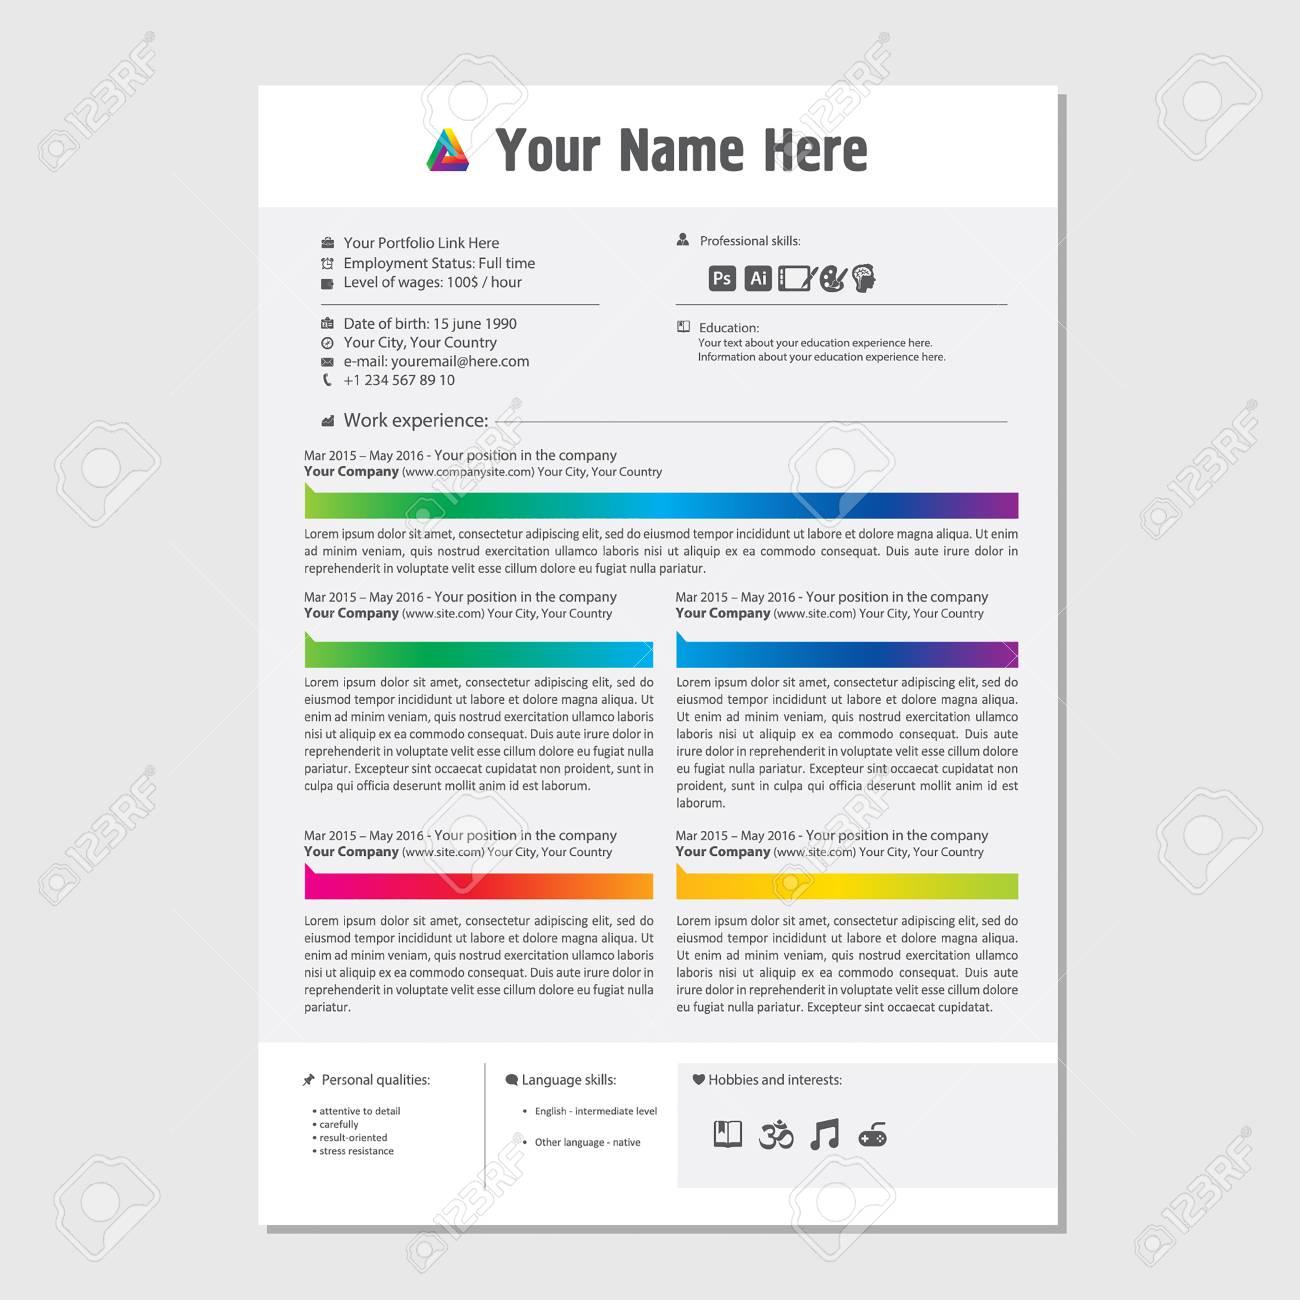 Professional Cv Resume Color Template Design For A Creative Person